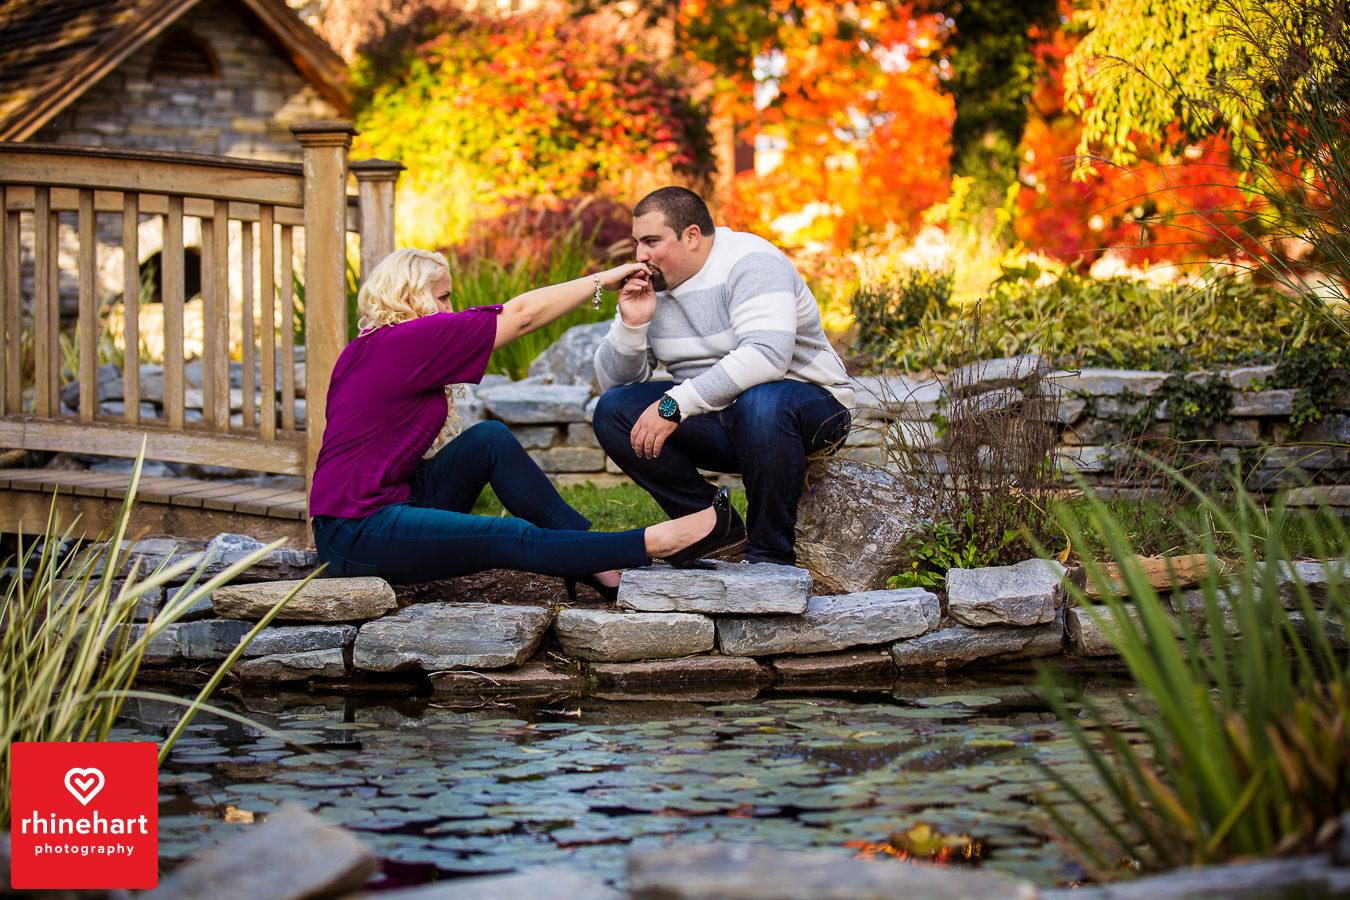 lebanon-valley-college-wedding-engagement-photographers-creative-unique-top-best-10